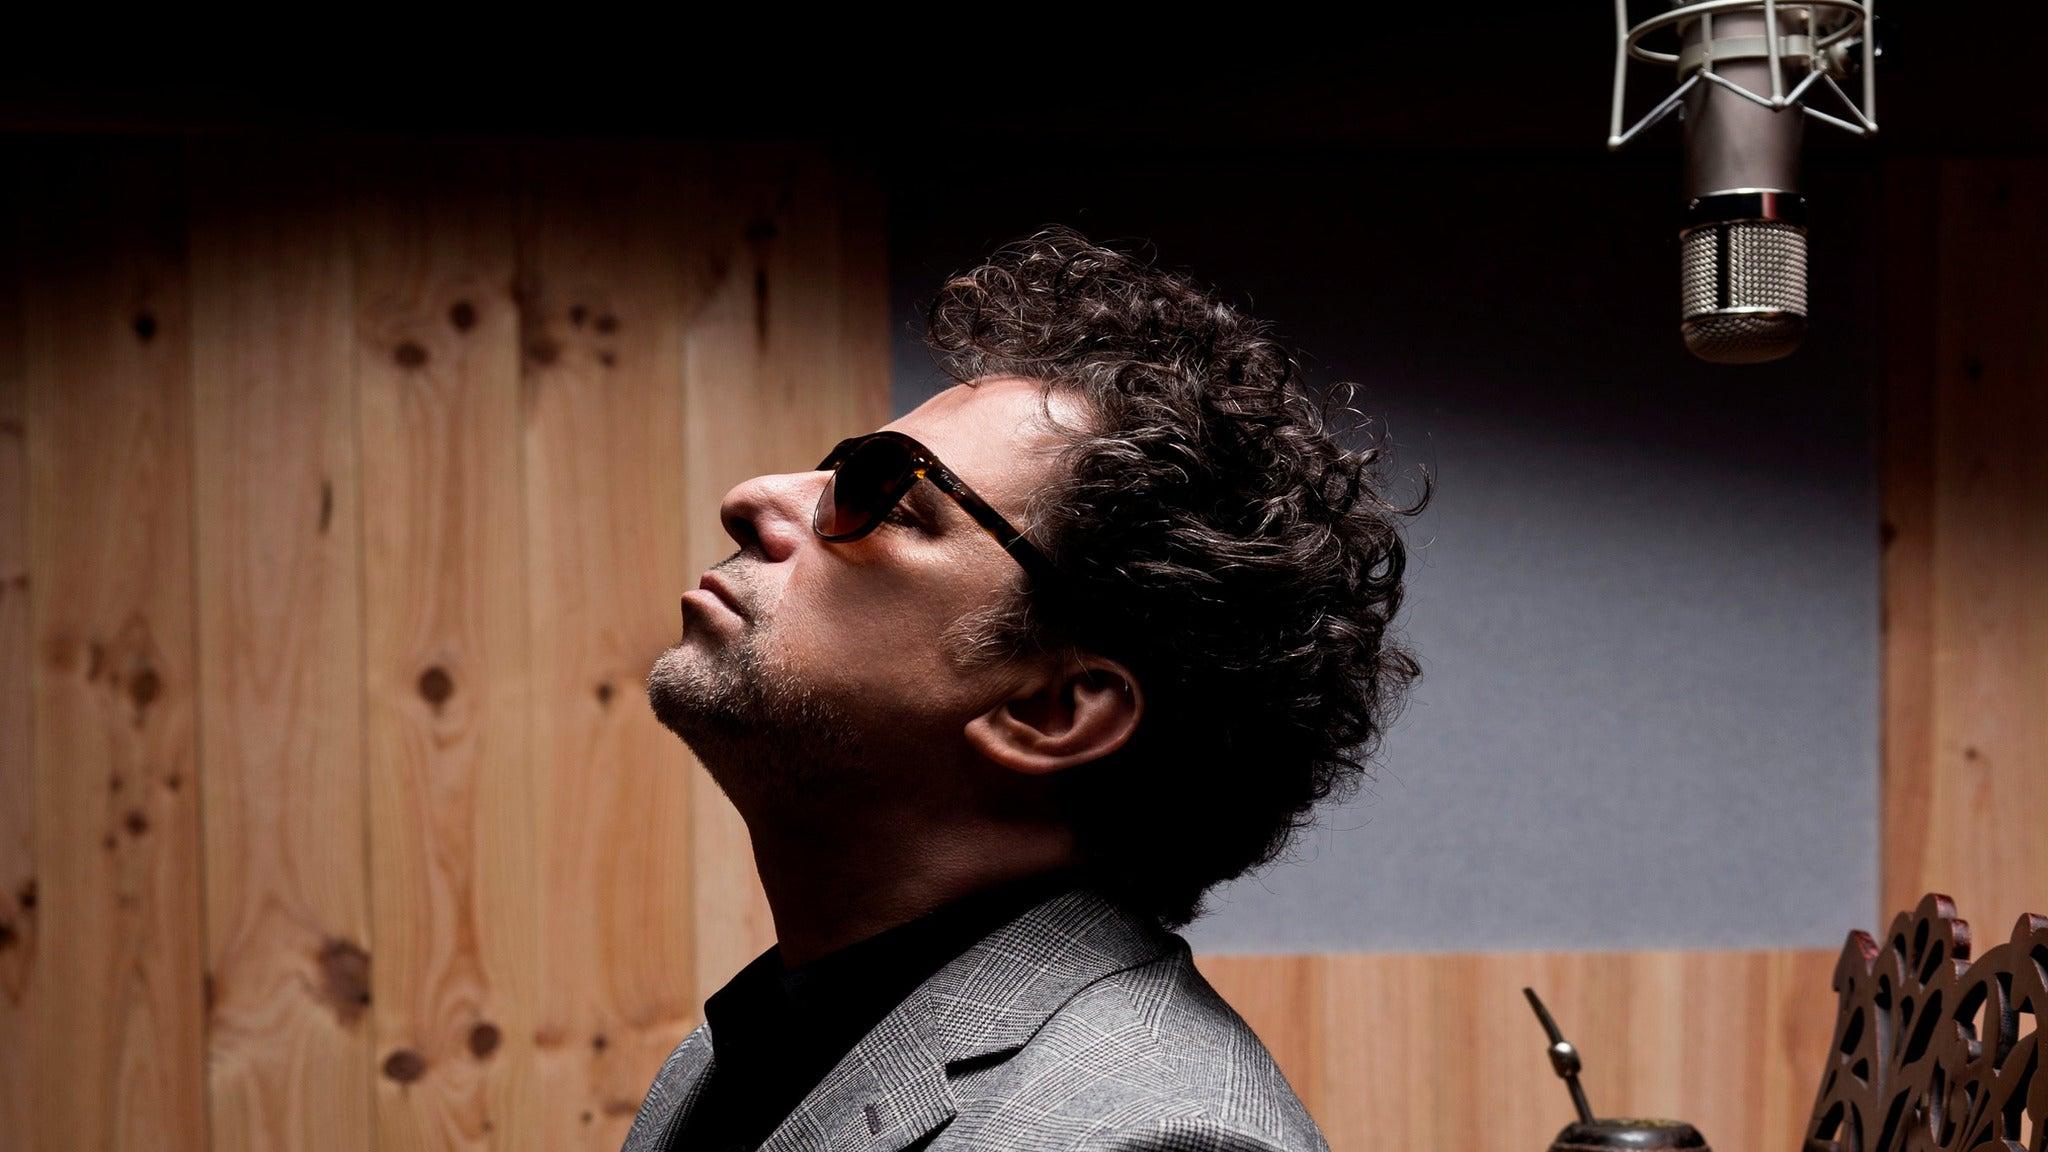 Andrés Calamaro at The Wiltern